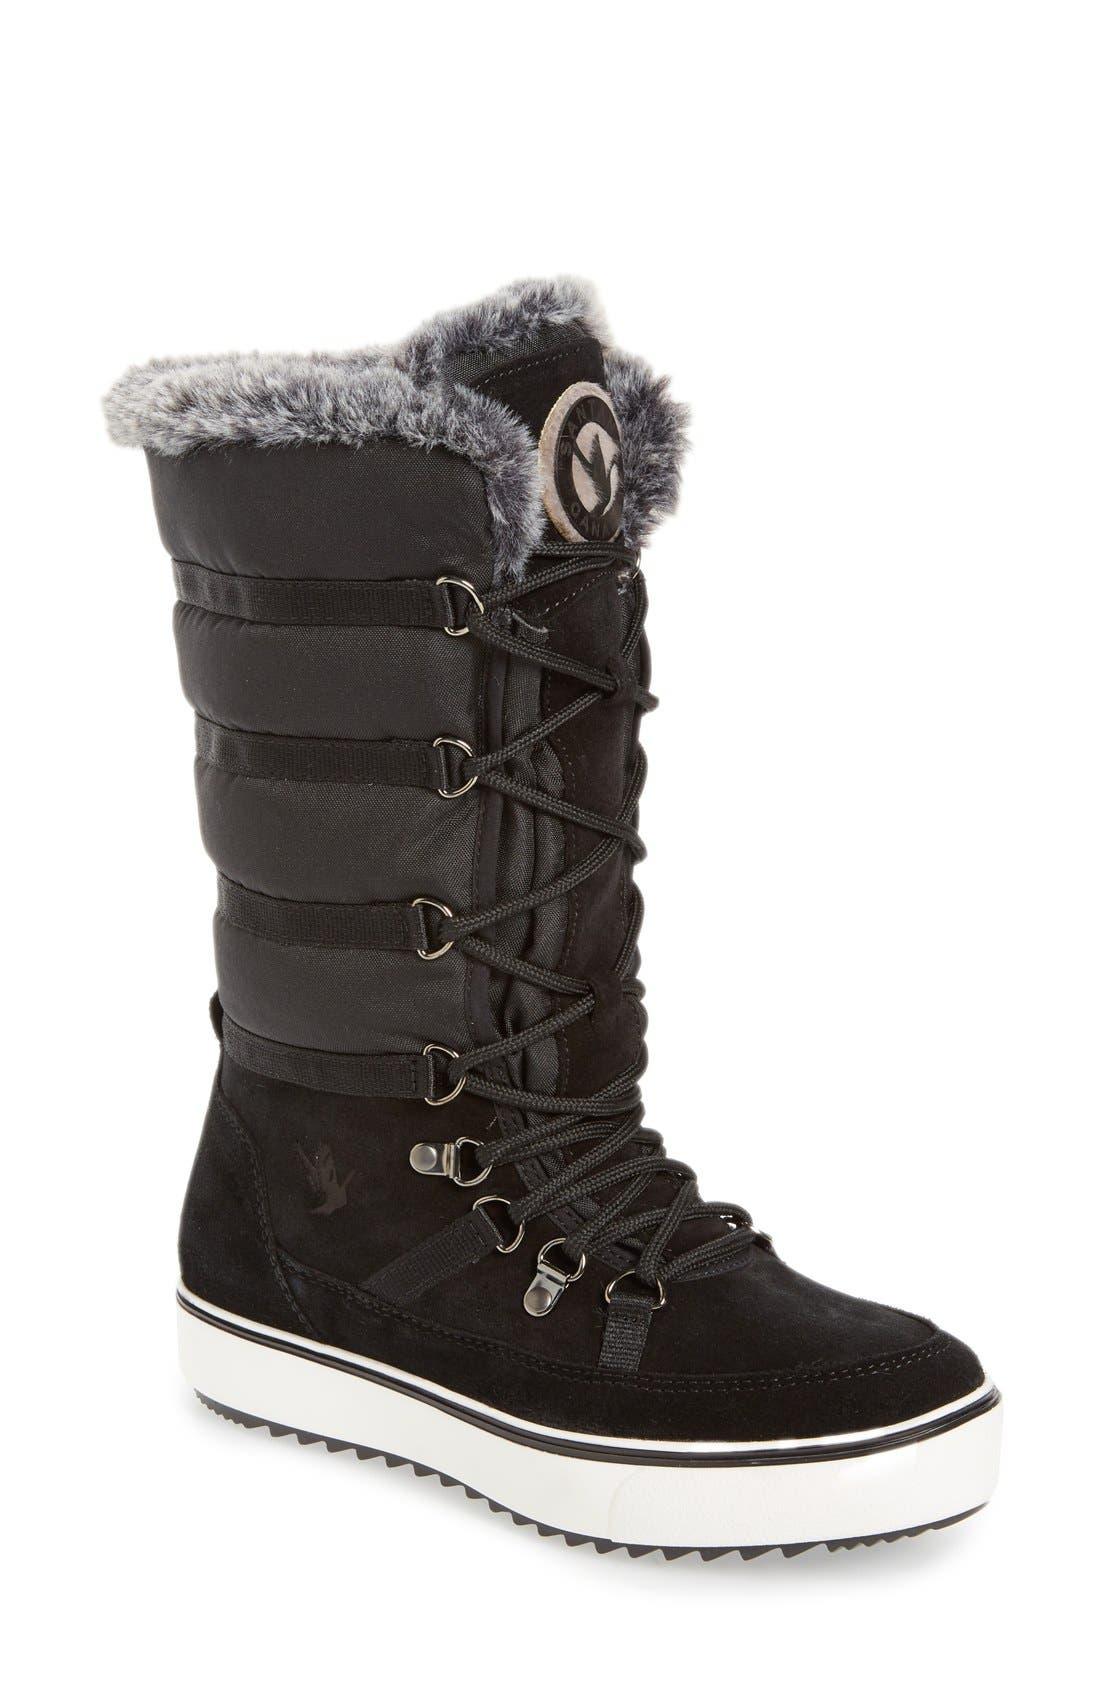 Alternate Image 1 Selected - Santana Canada 'Mackenzie' Faux Fur Waterproof Boot (Women)